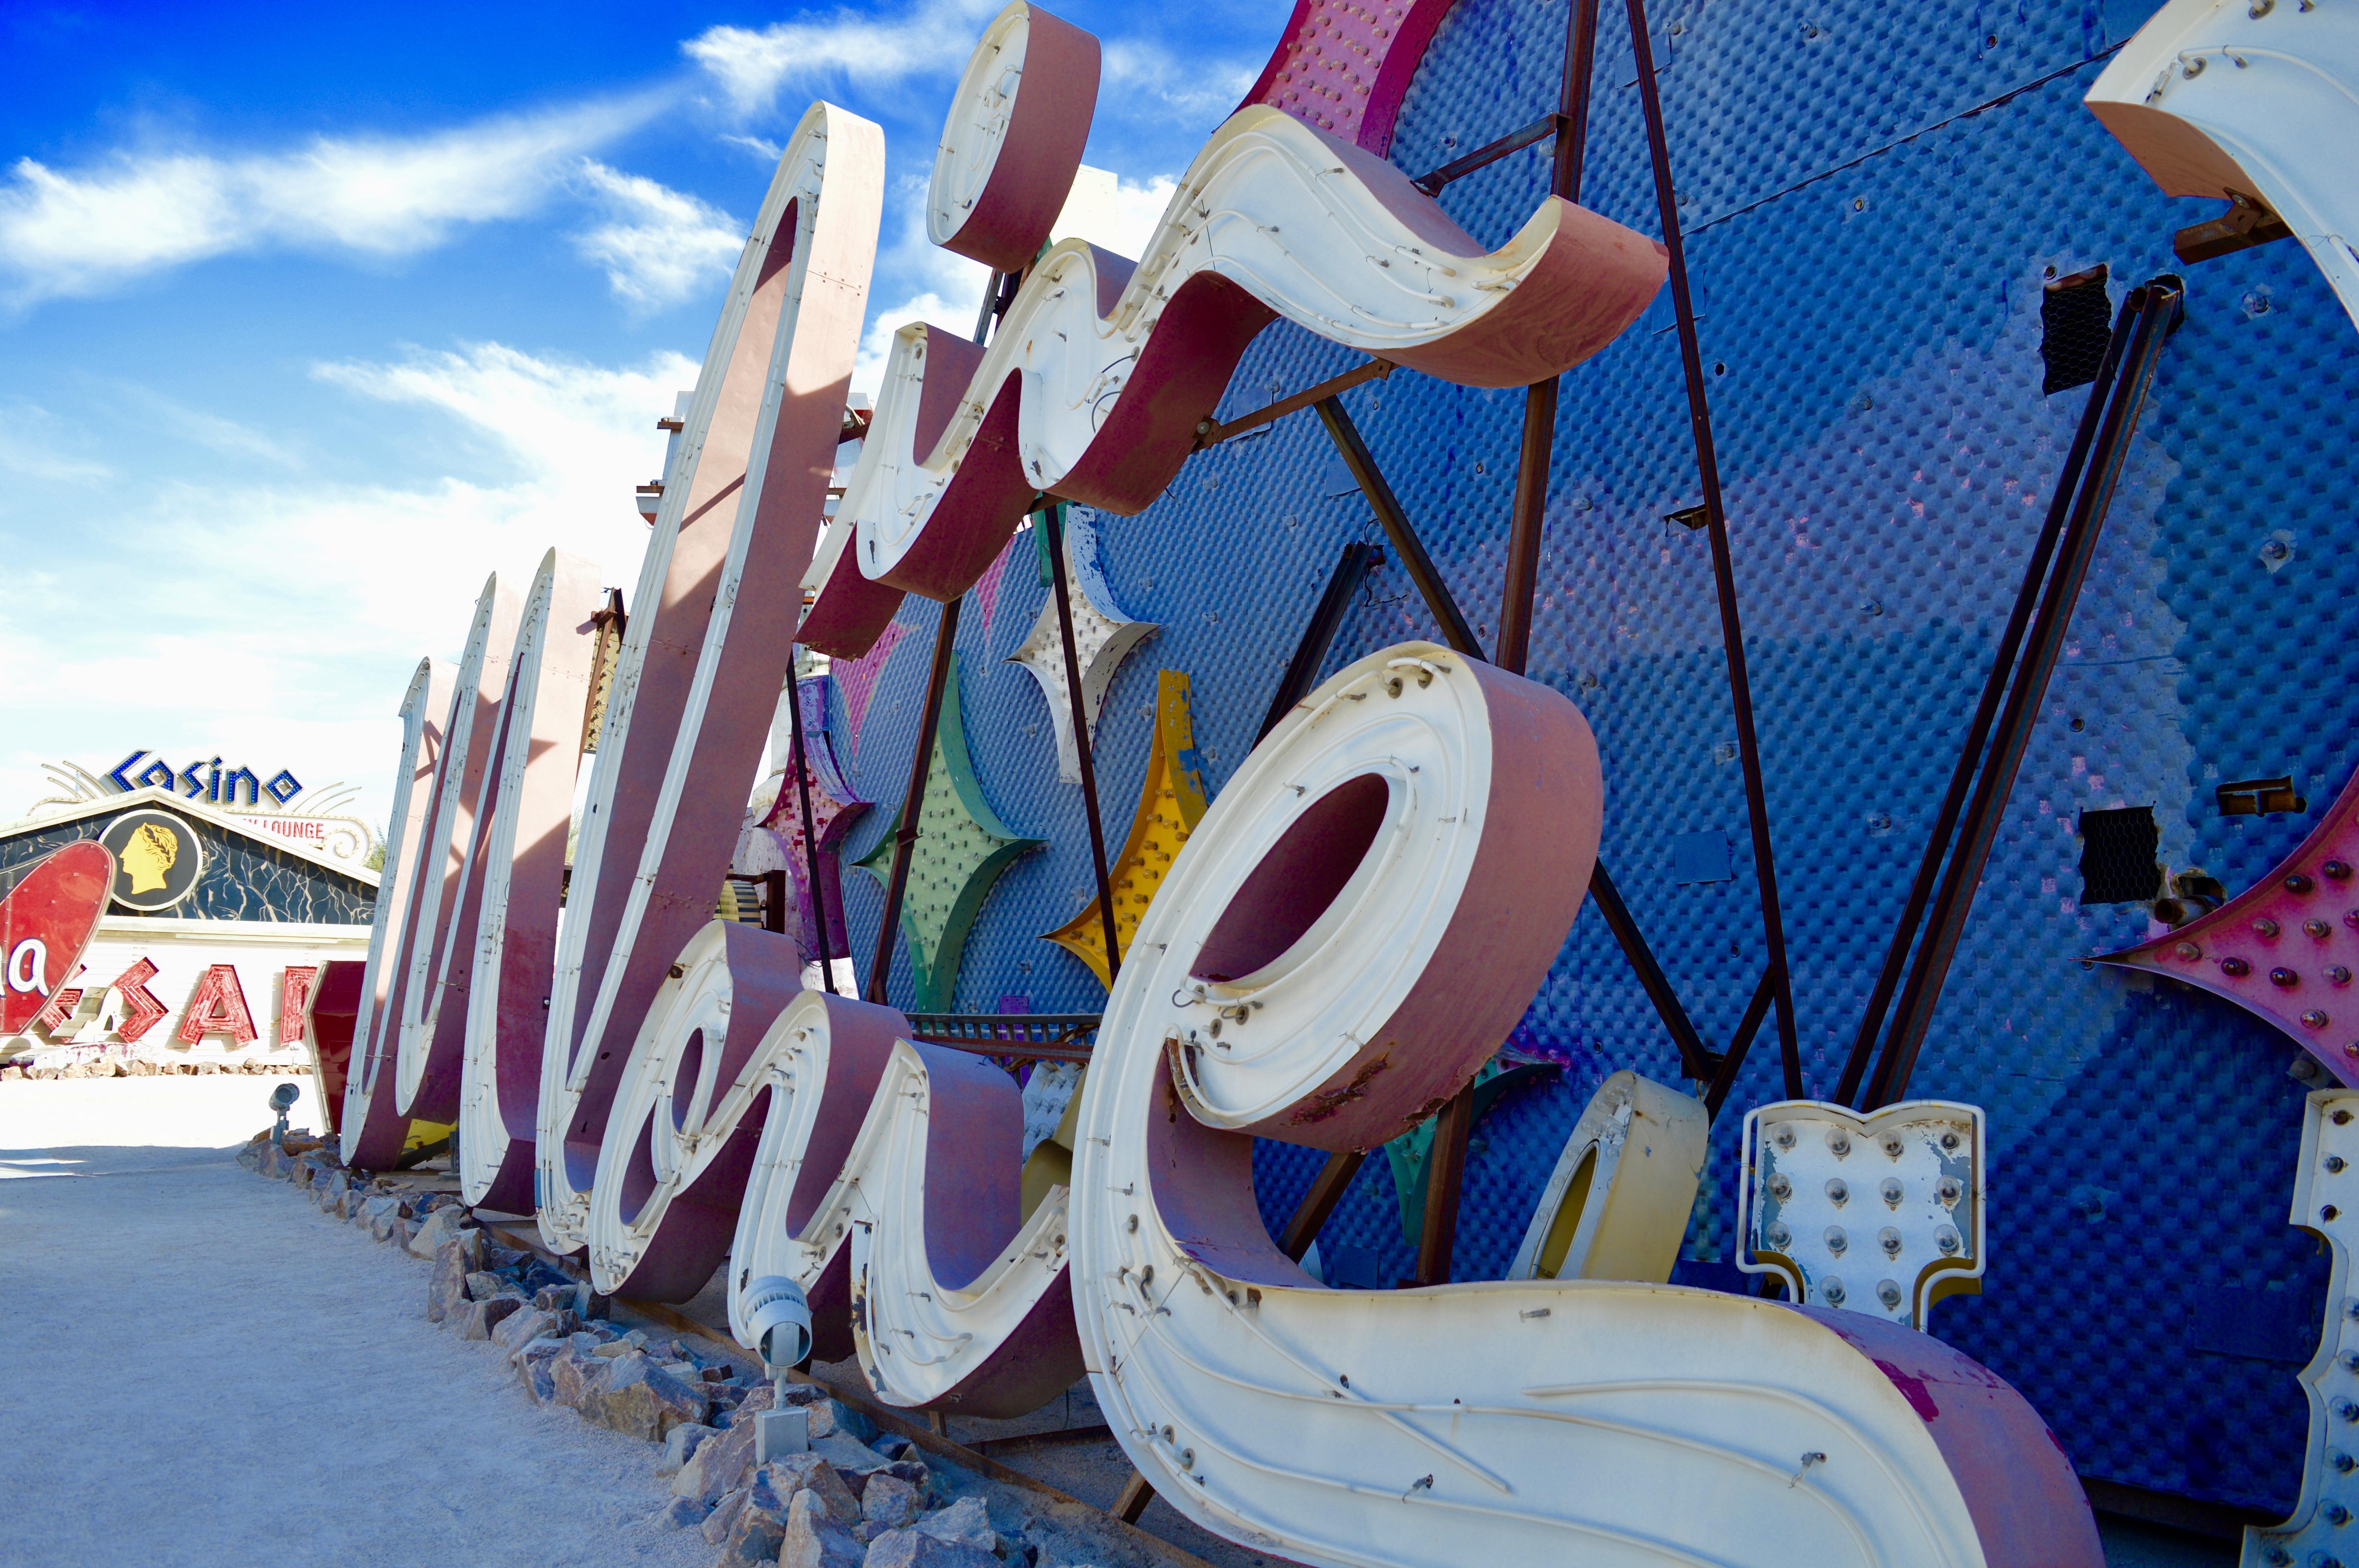 Moulin Rouge | The Neon Boneyard Museum | Las Vegas | What should I do in Las Vegas? | Travel tips for Las Vegas Nevada | Travel Blog | Elle Blonde Luxury Lifestyle Destination Blog